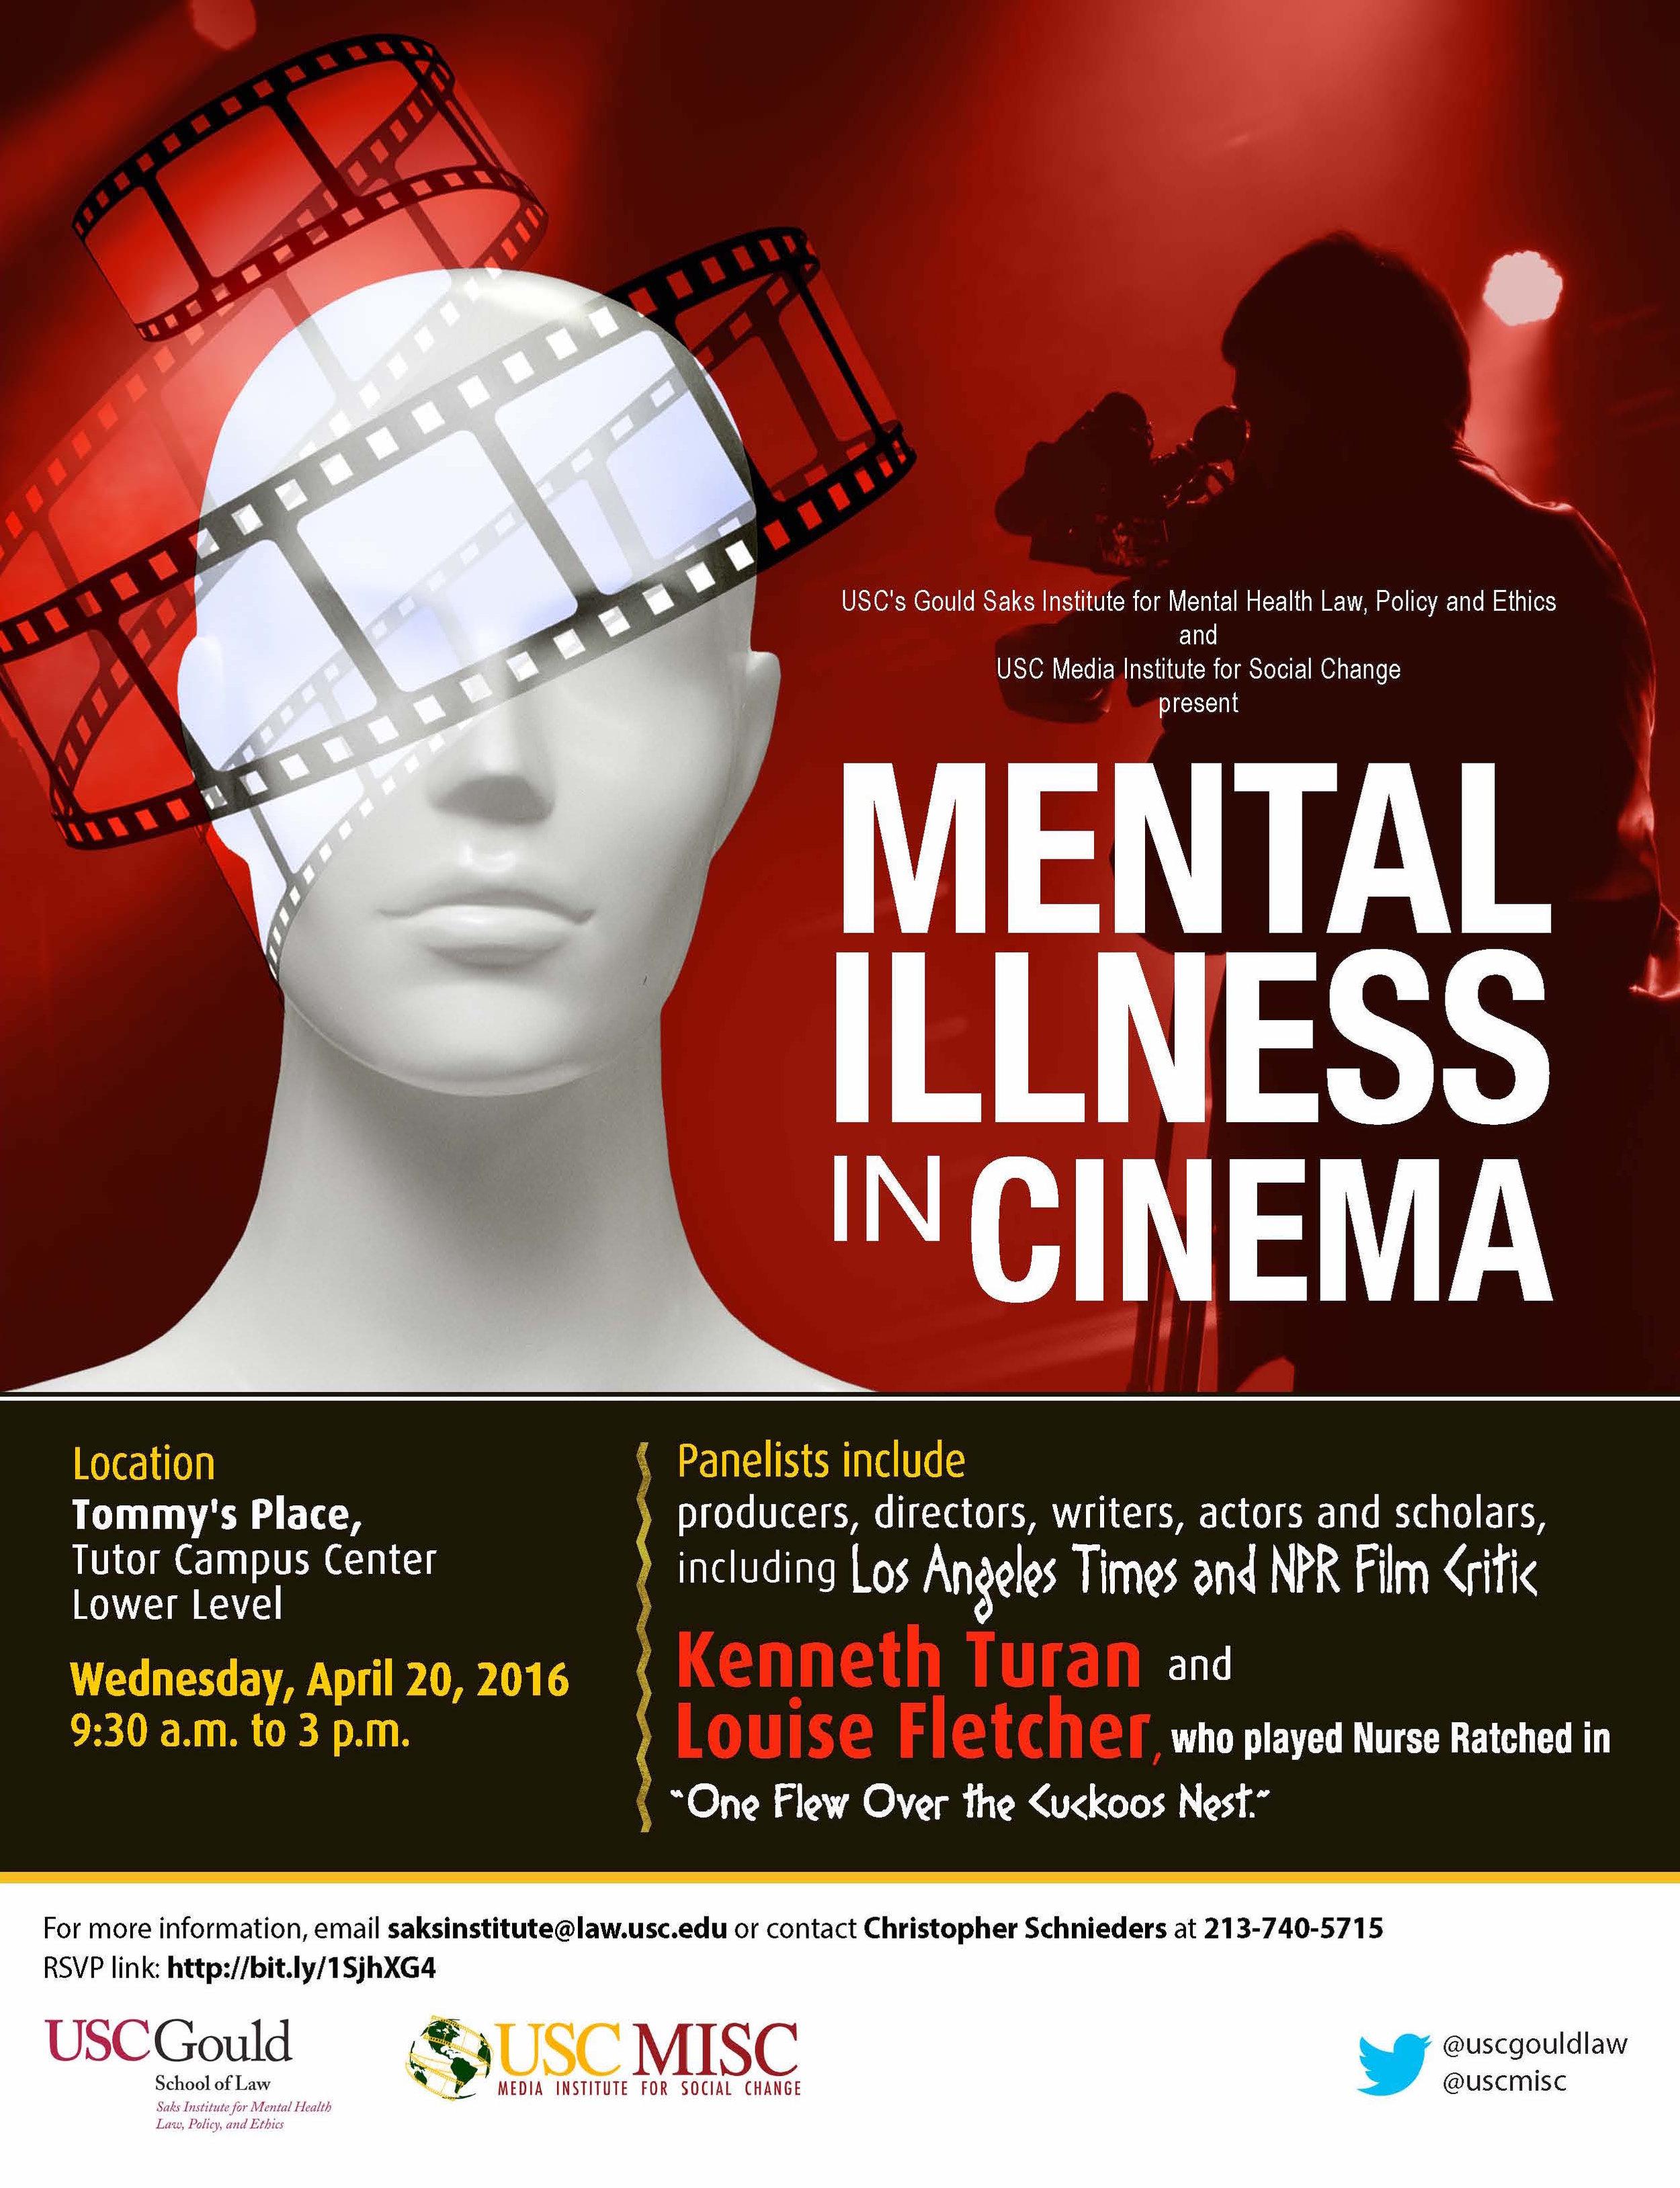 USC MISC Saks Institute Present Mental Illness in Cinema